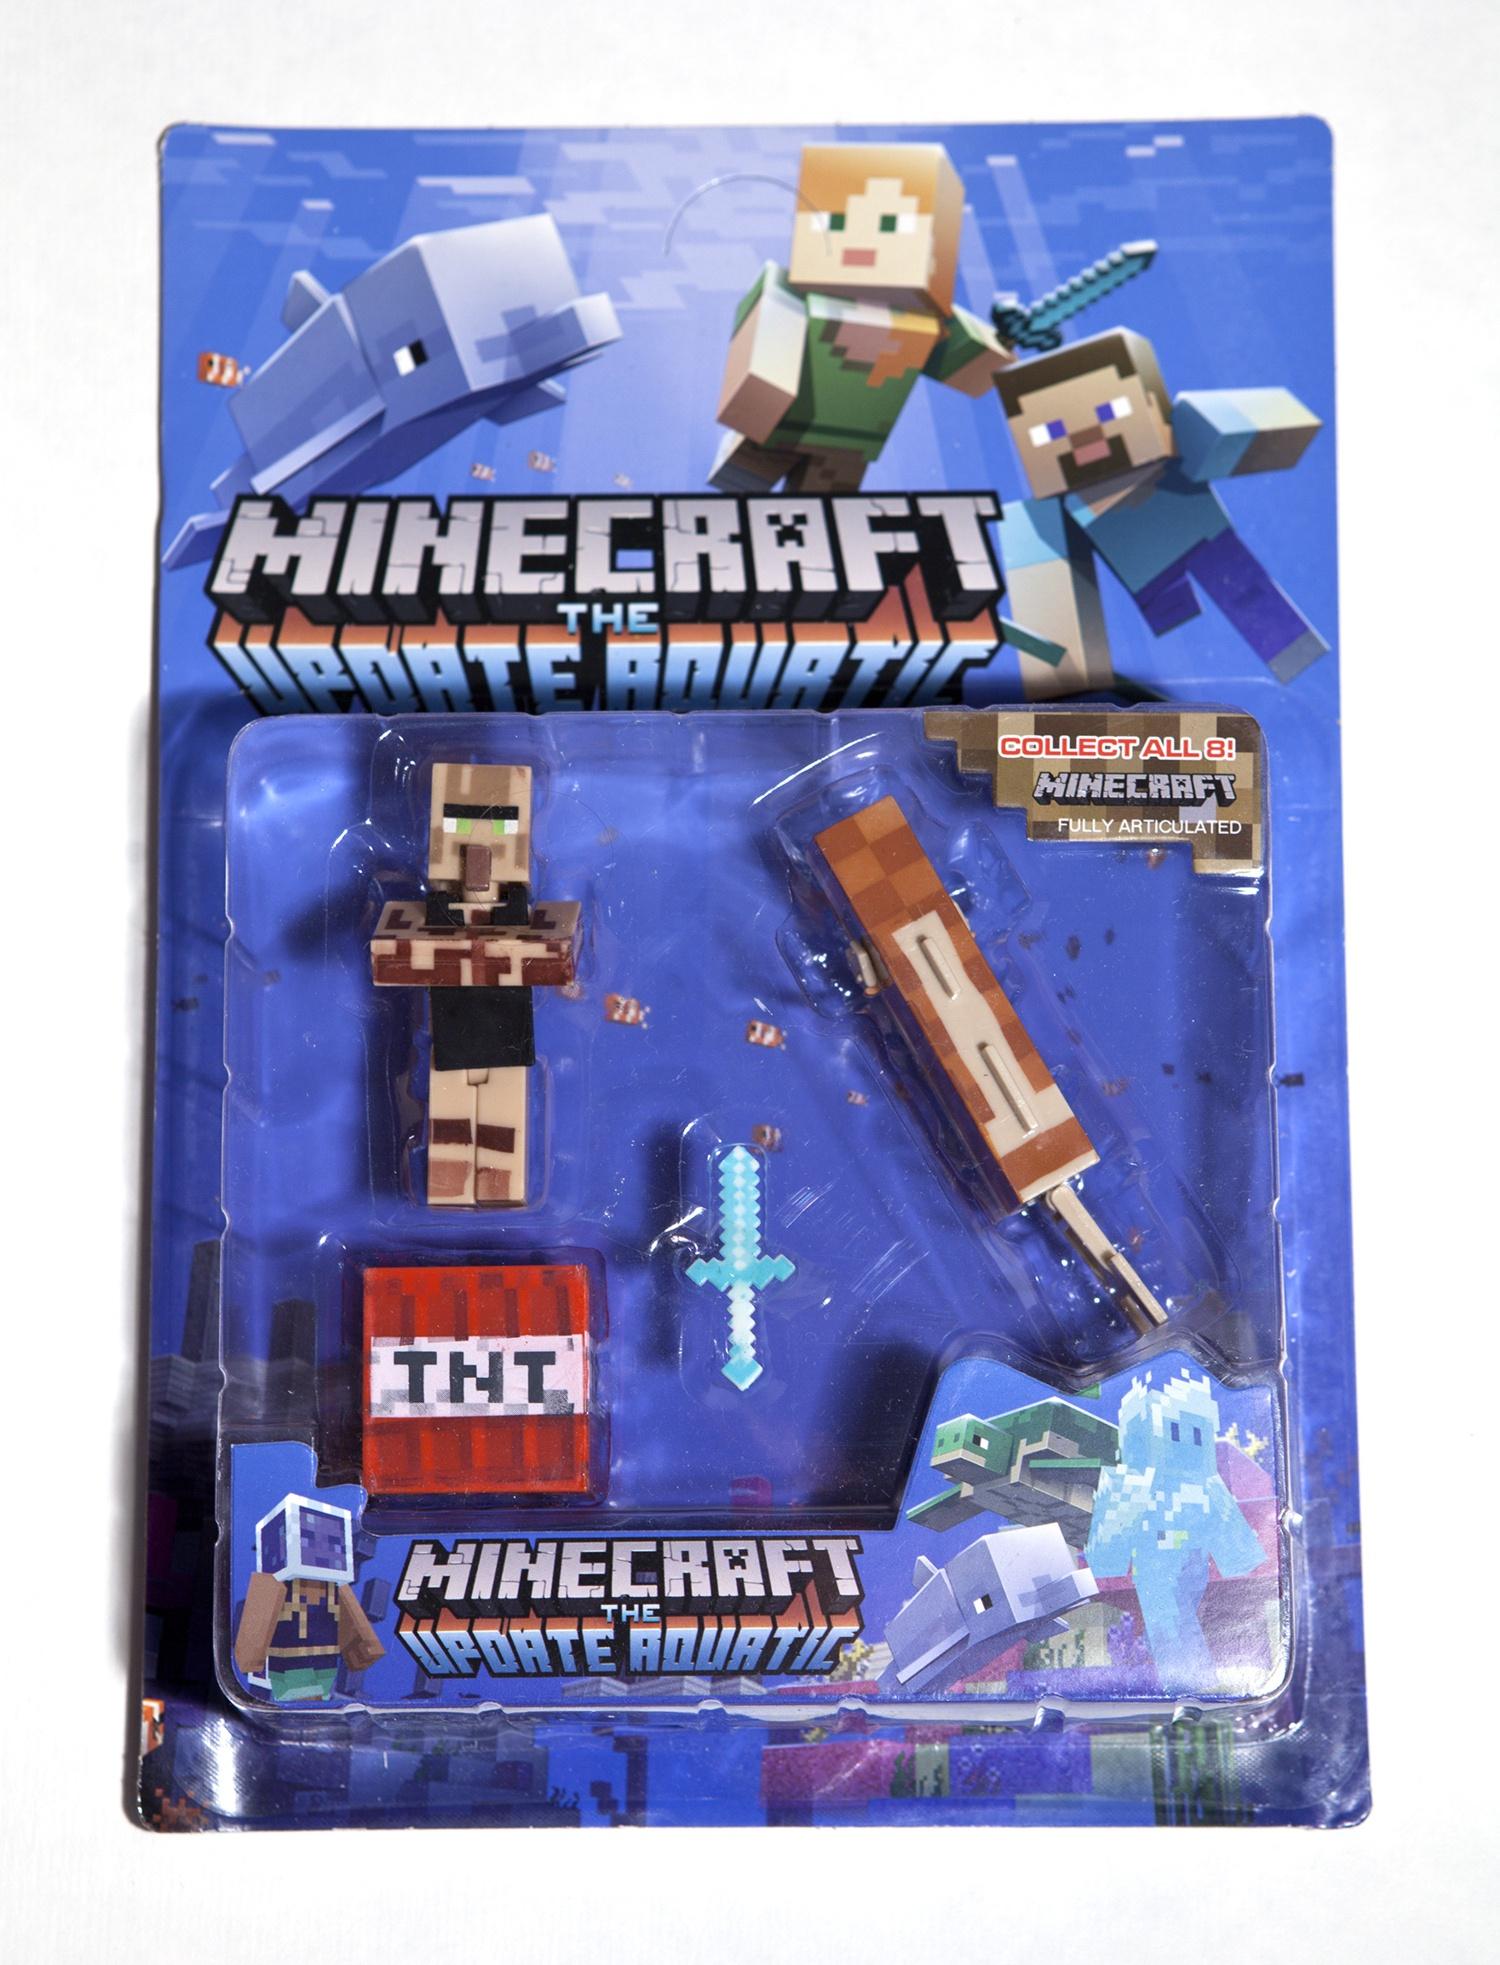 Набор фигурок Minecraft The Update Aquatic small: Pack 4 набор фигурок minecraft blacksmith with apron and anvil 8 см